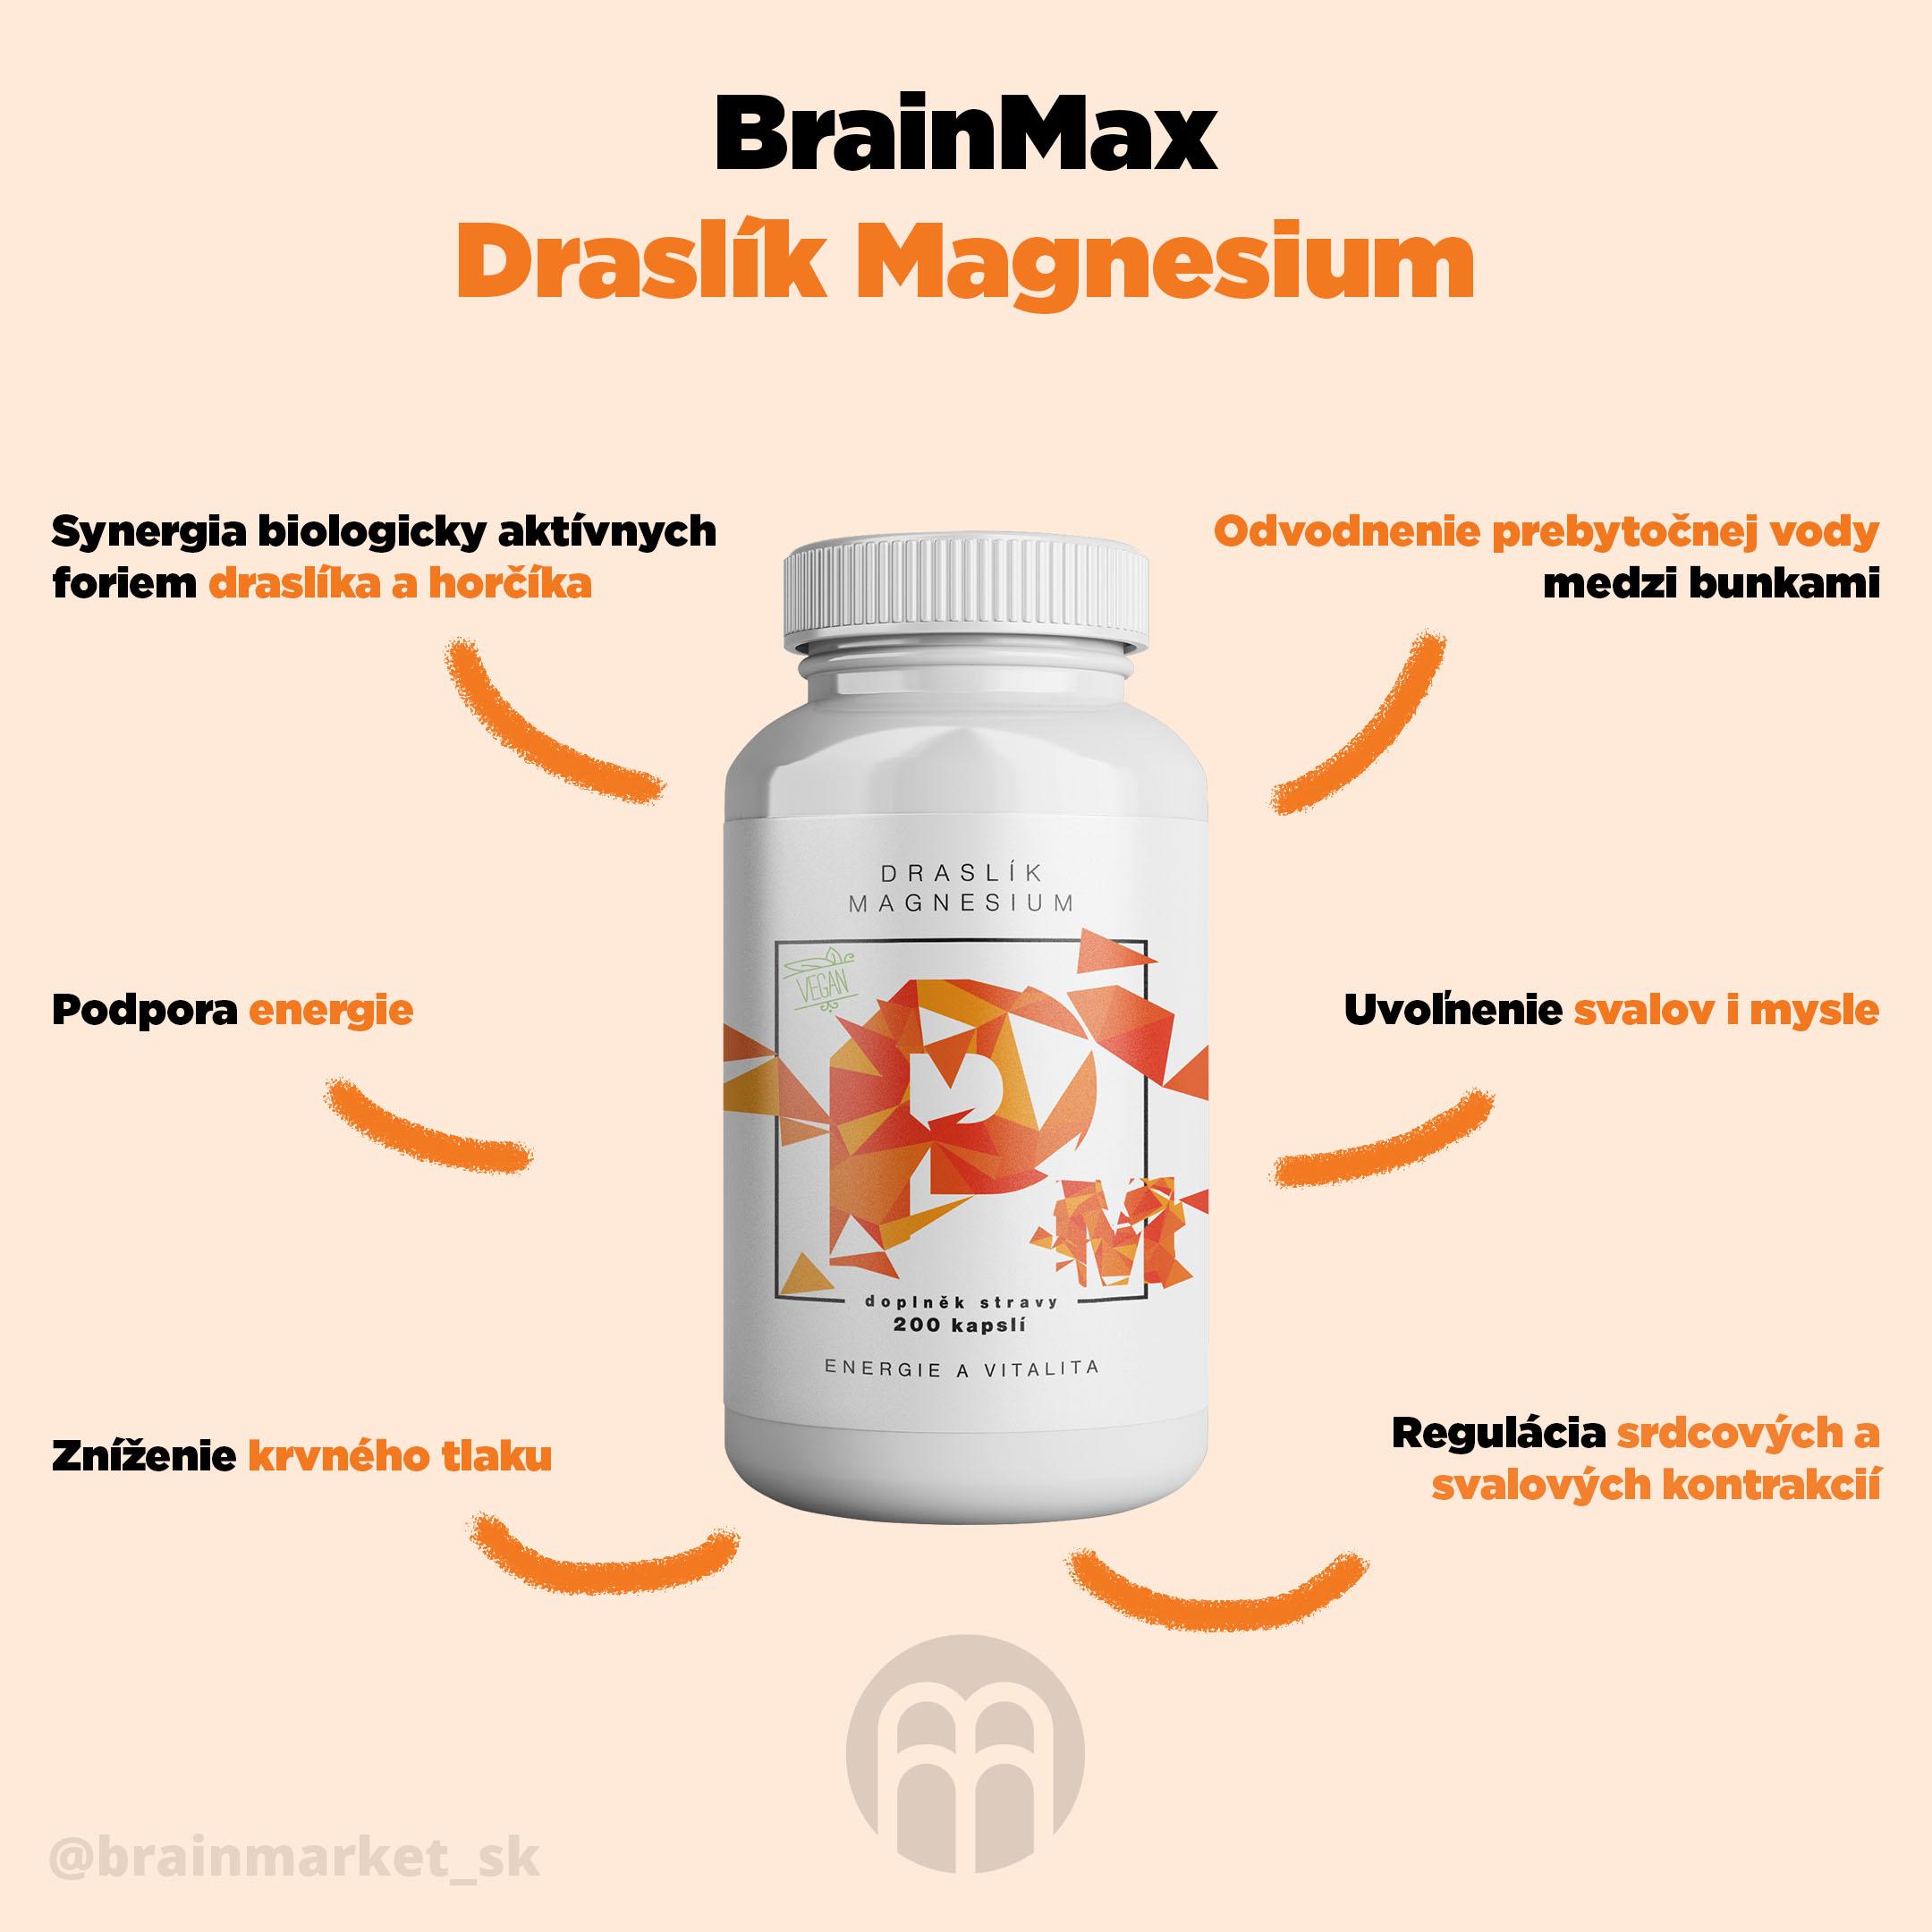 brainmax_draslik_magnesium_infografika_brainmarket_SK